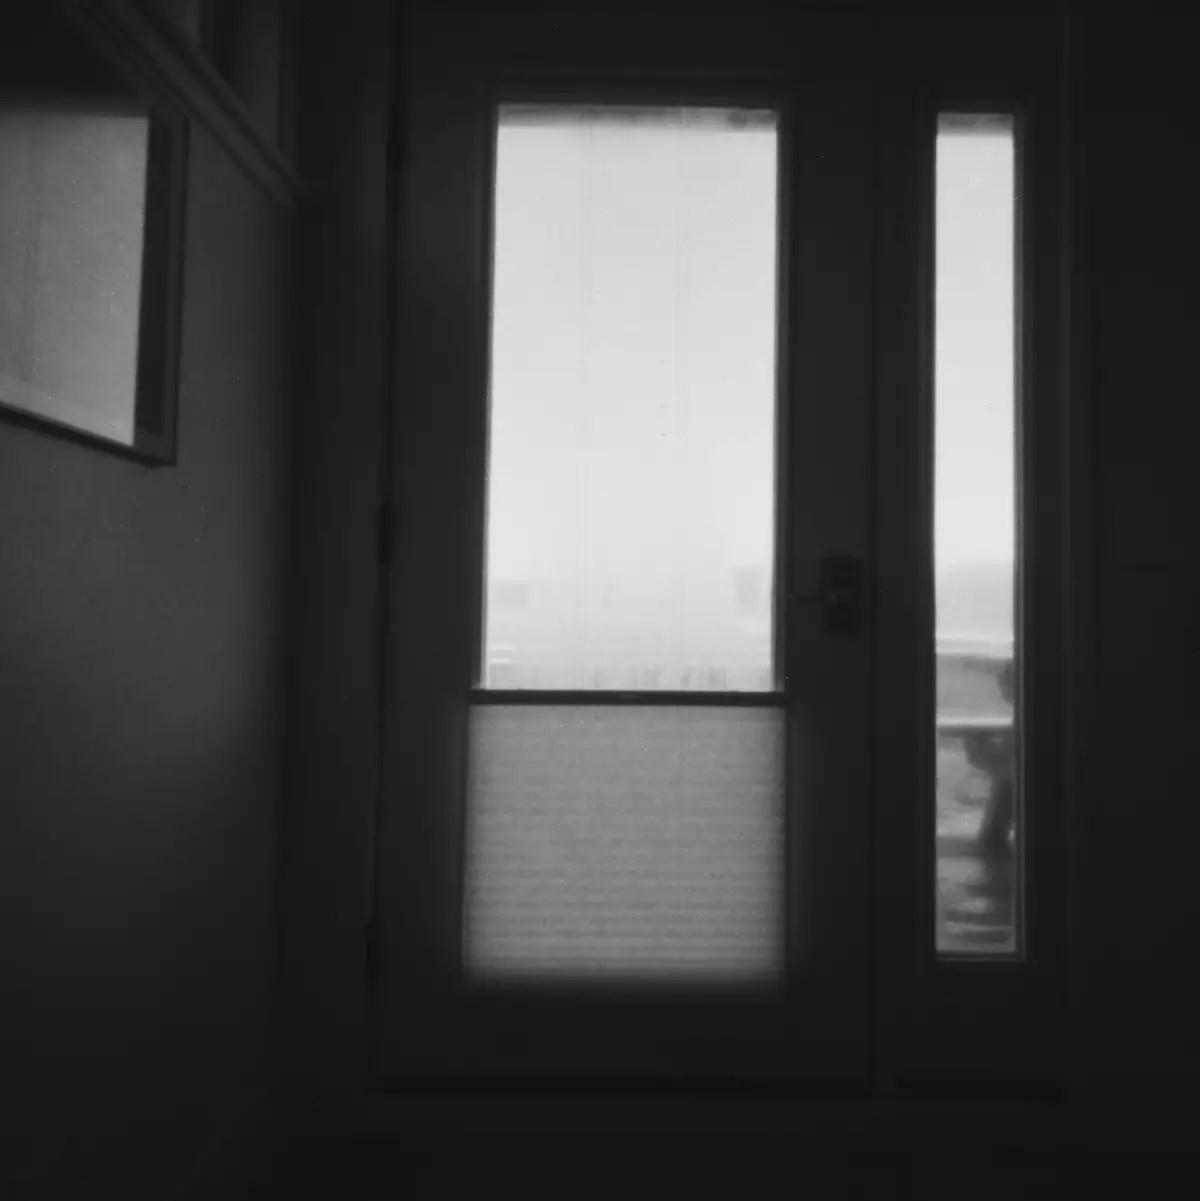 Doors and Windows - 5 Frames With... ILFORD PAN F PLUS (EI 50 / 120 format / Vermeer 6x6 Pinhole) - by María Ochoa